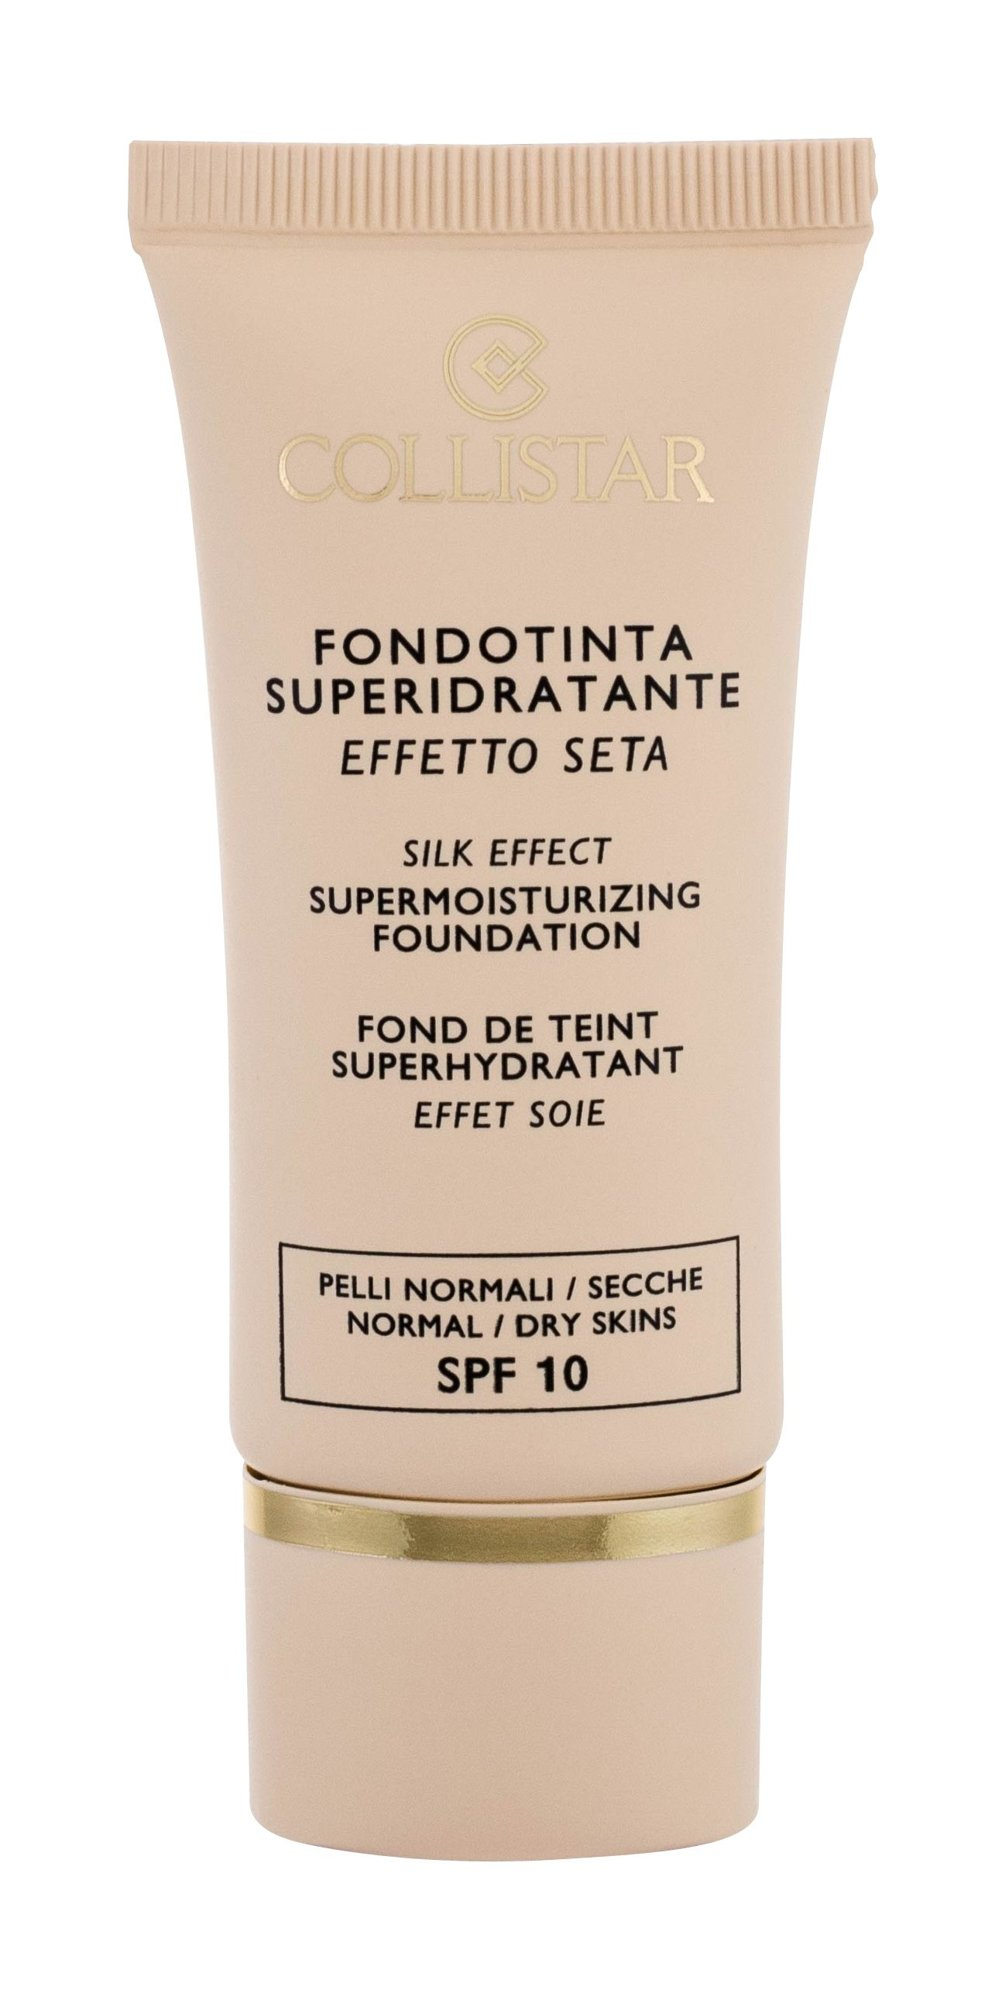 Collistar Silk Effect Supermoisturizing Foundation Cosmetic 30ml 3 Peach